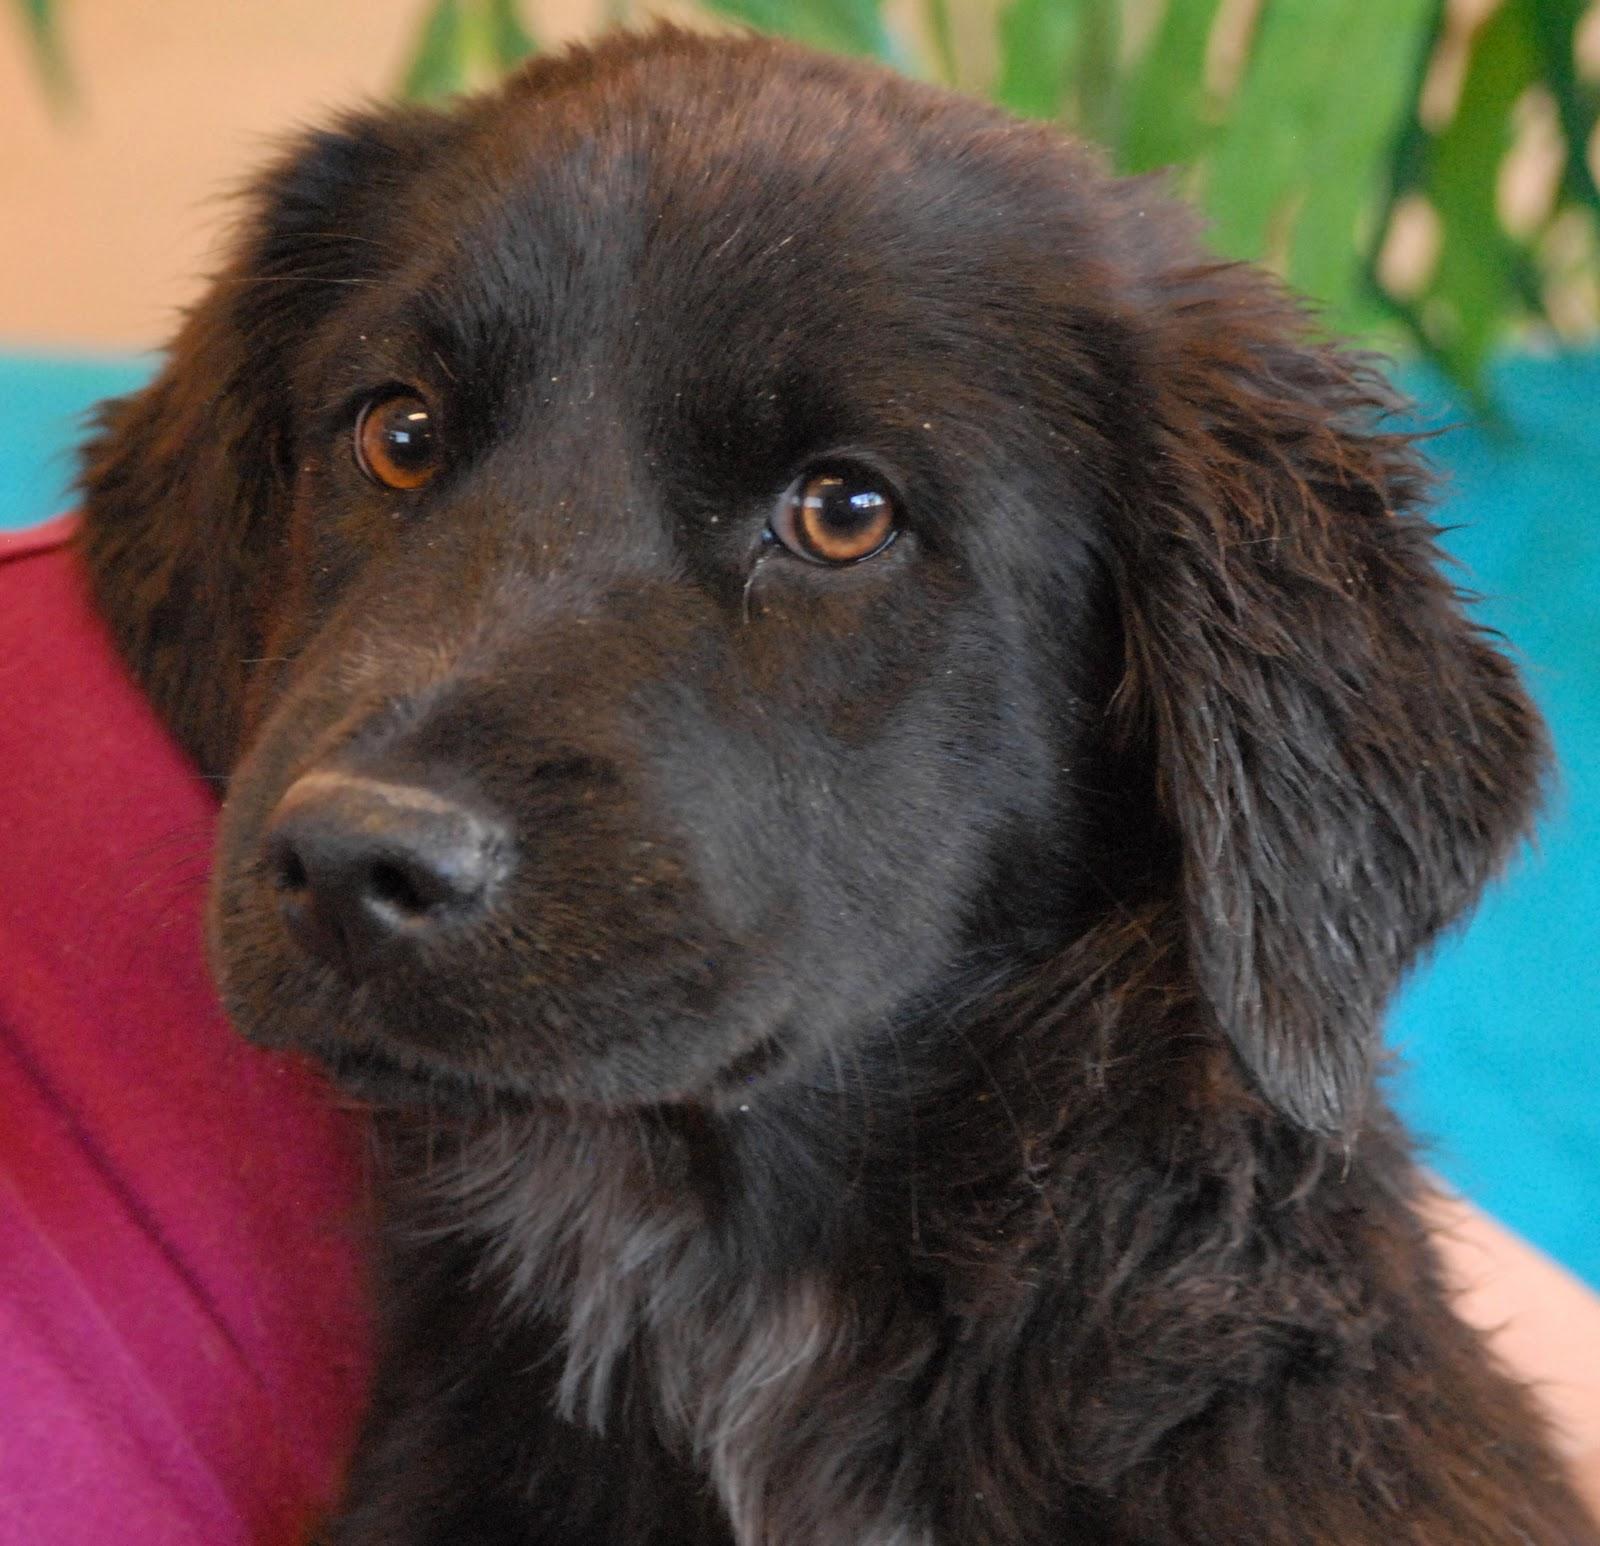 Adoption: Nevada SPCA Animal Rescue: Splish, Splash & Rubber Duckie